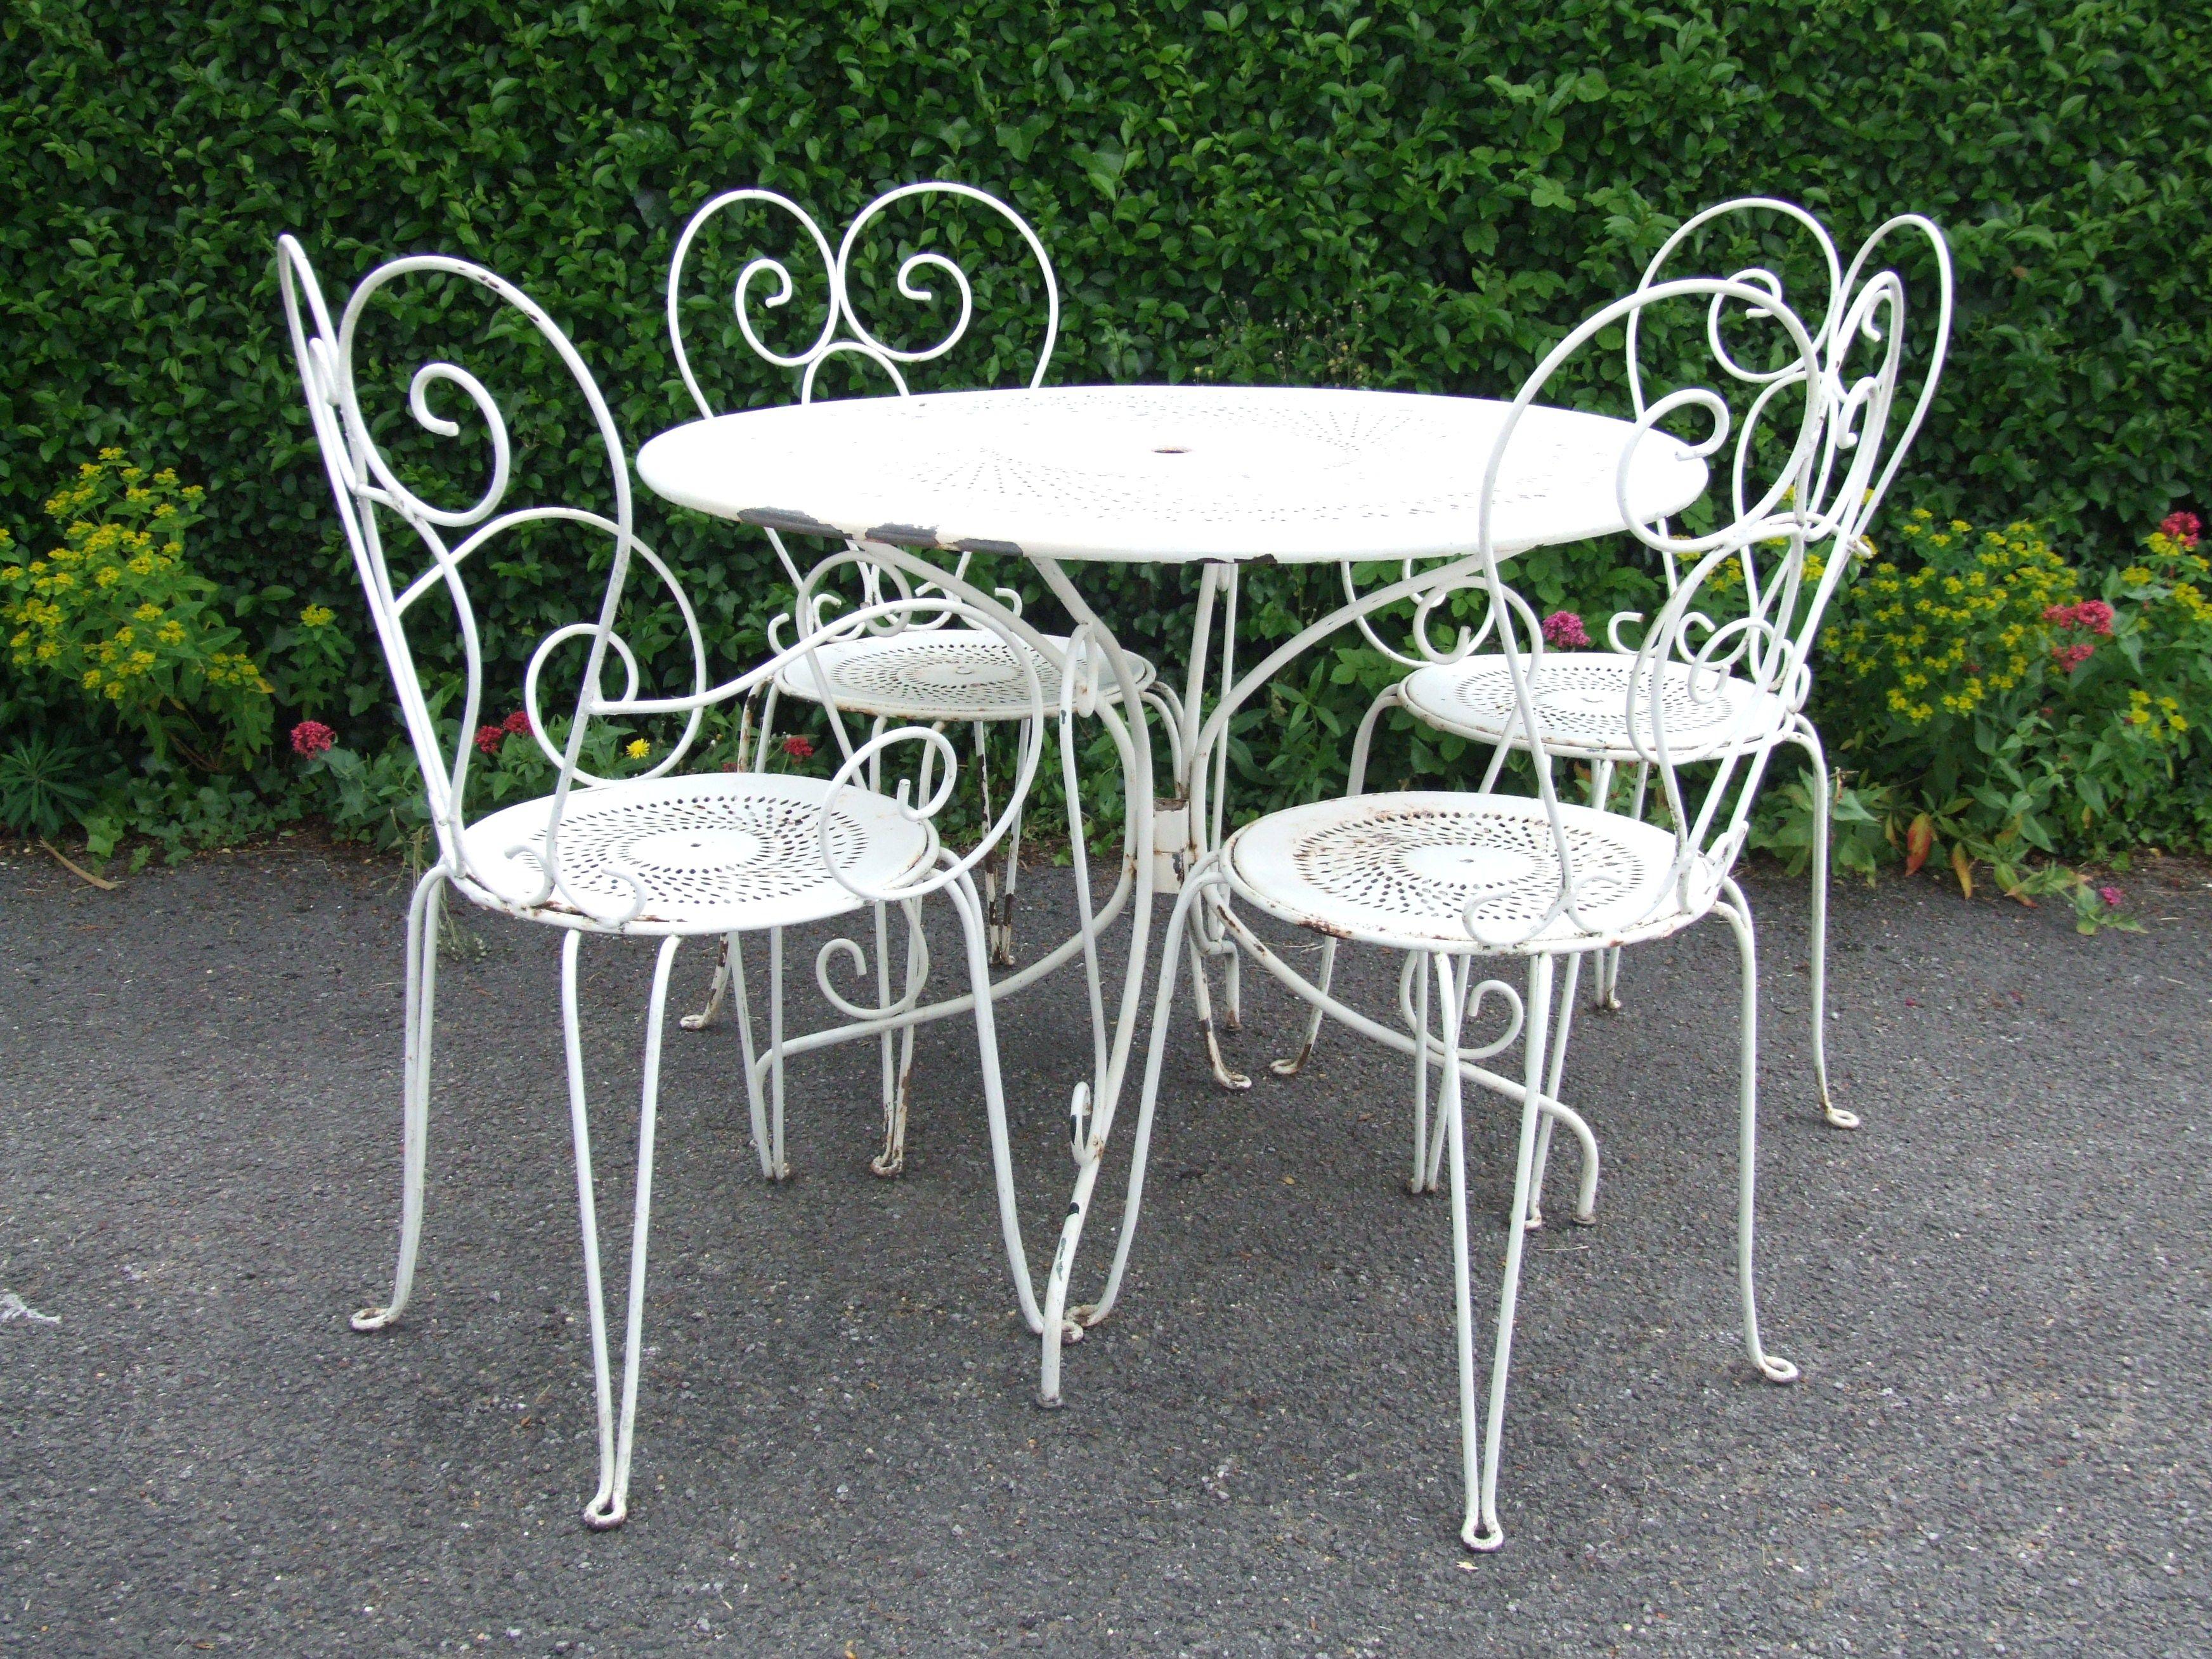 Download Wallpaper Wholesale Cast Iron Patio Furniture